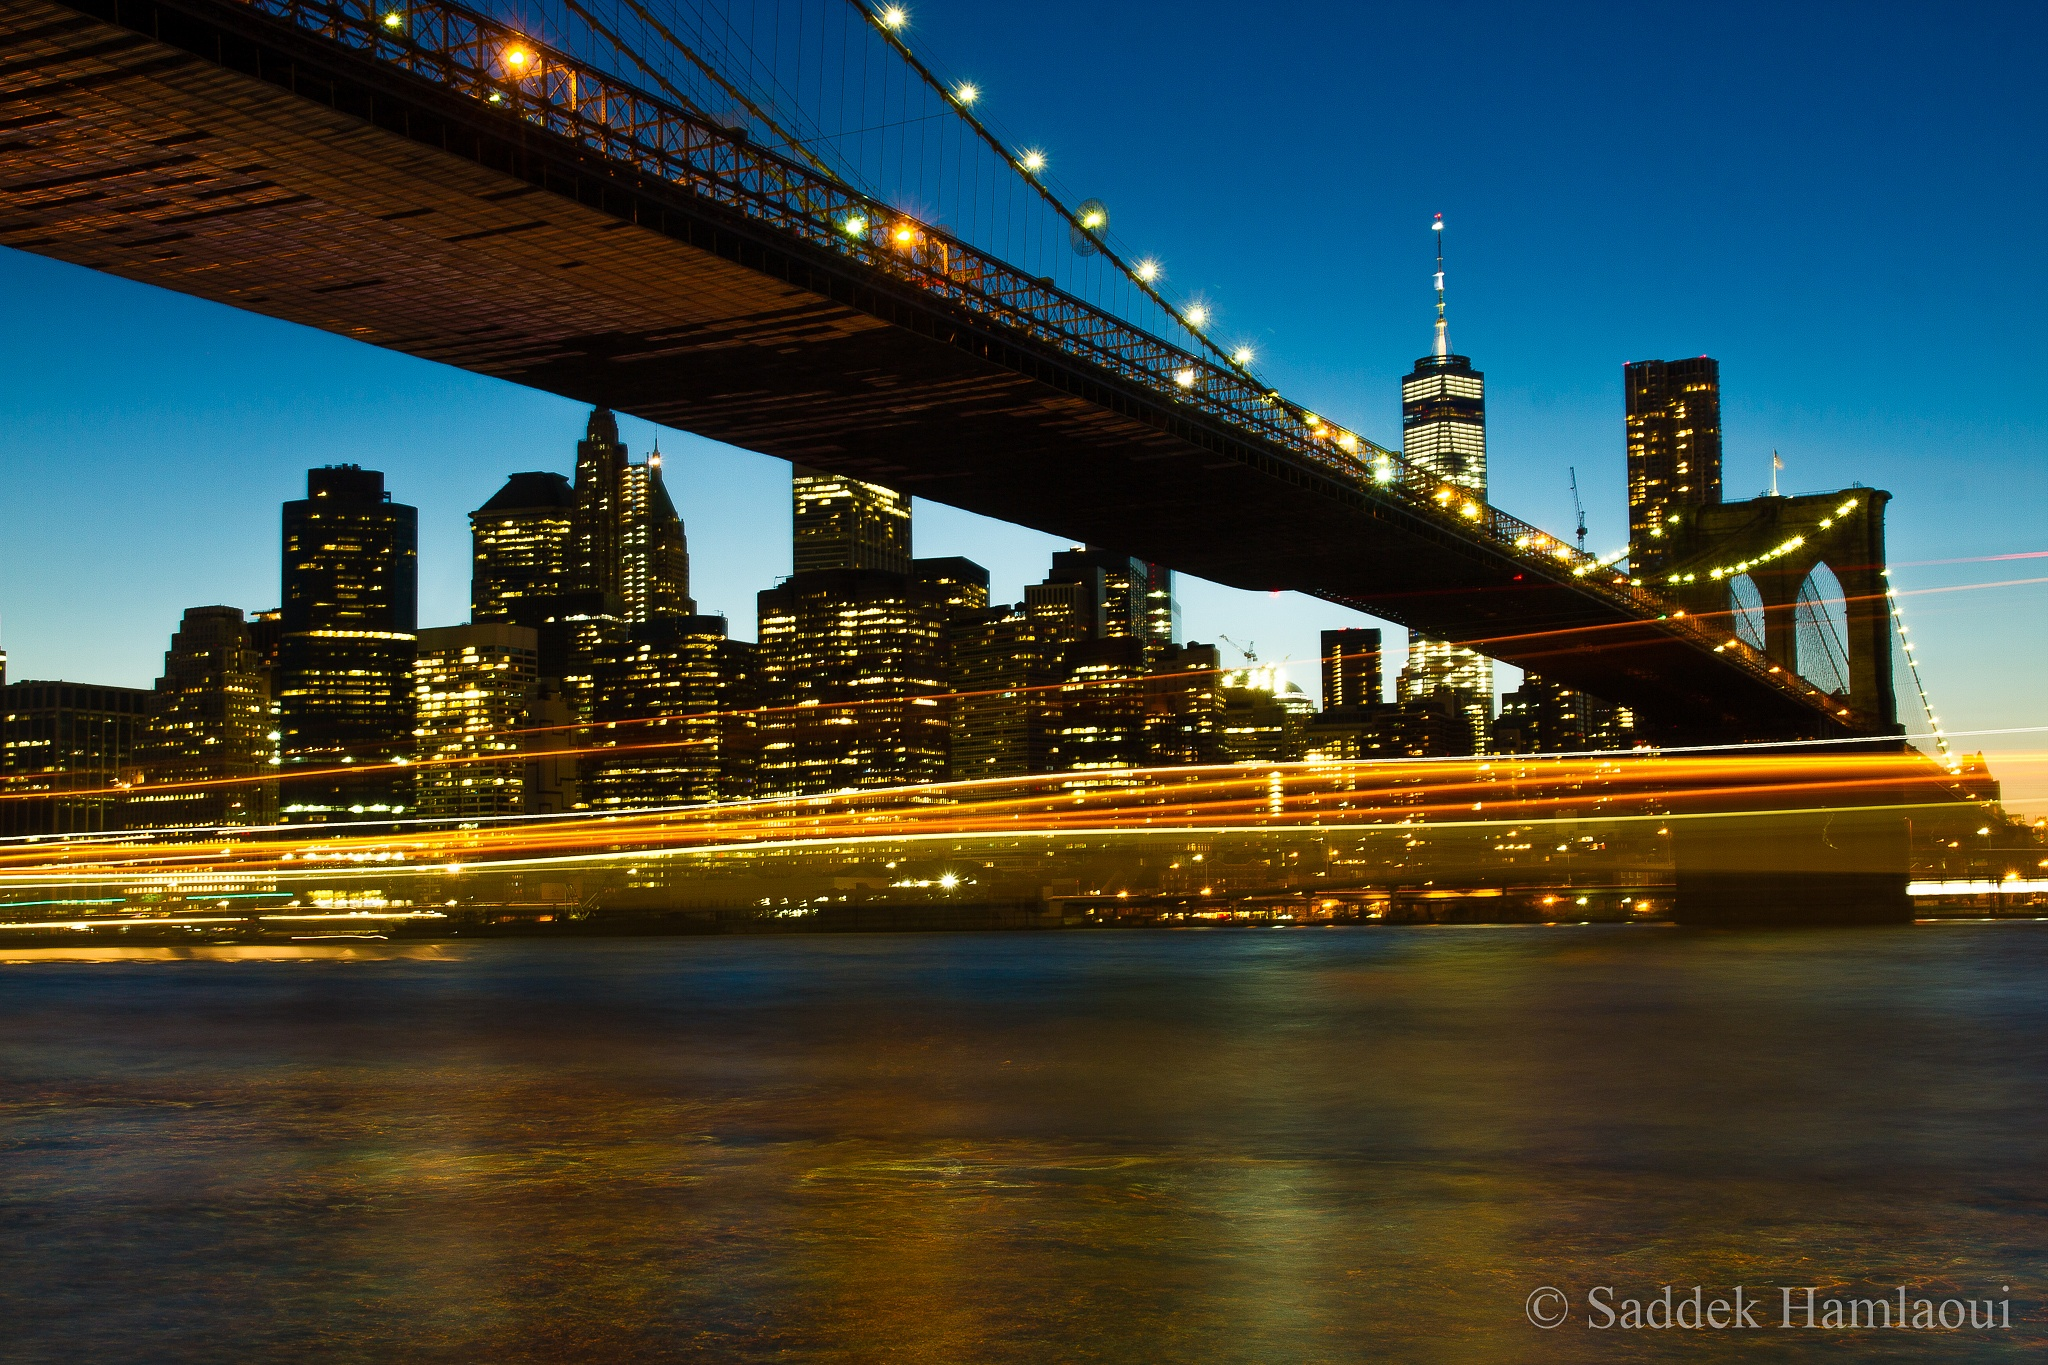 New York lights by hamlaoui.saddek